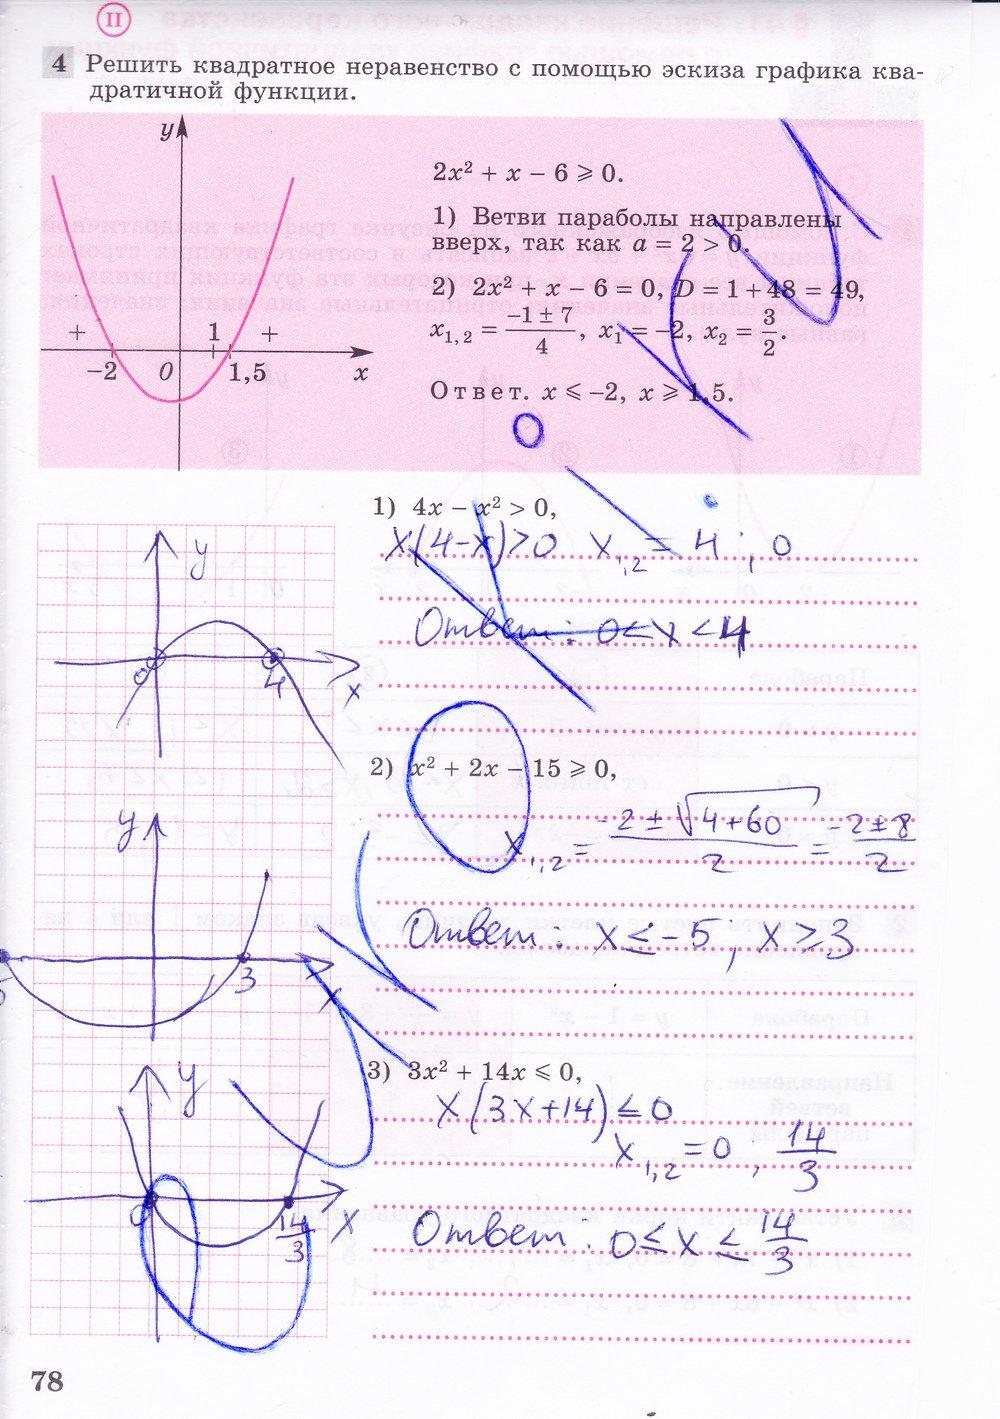 Гдз по алгебре 8 класса колягин ткачёва фёдорова шабунин